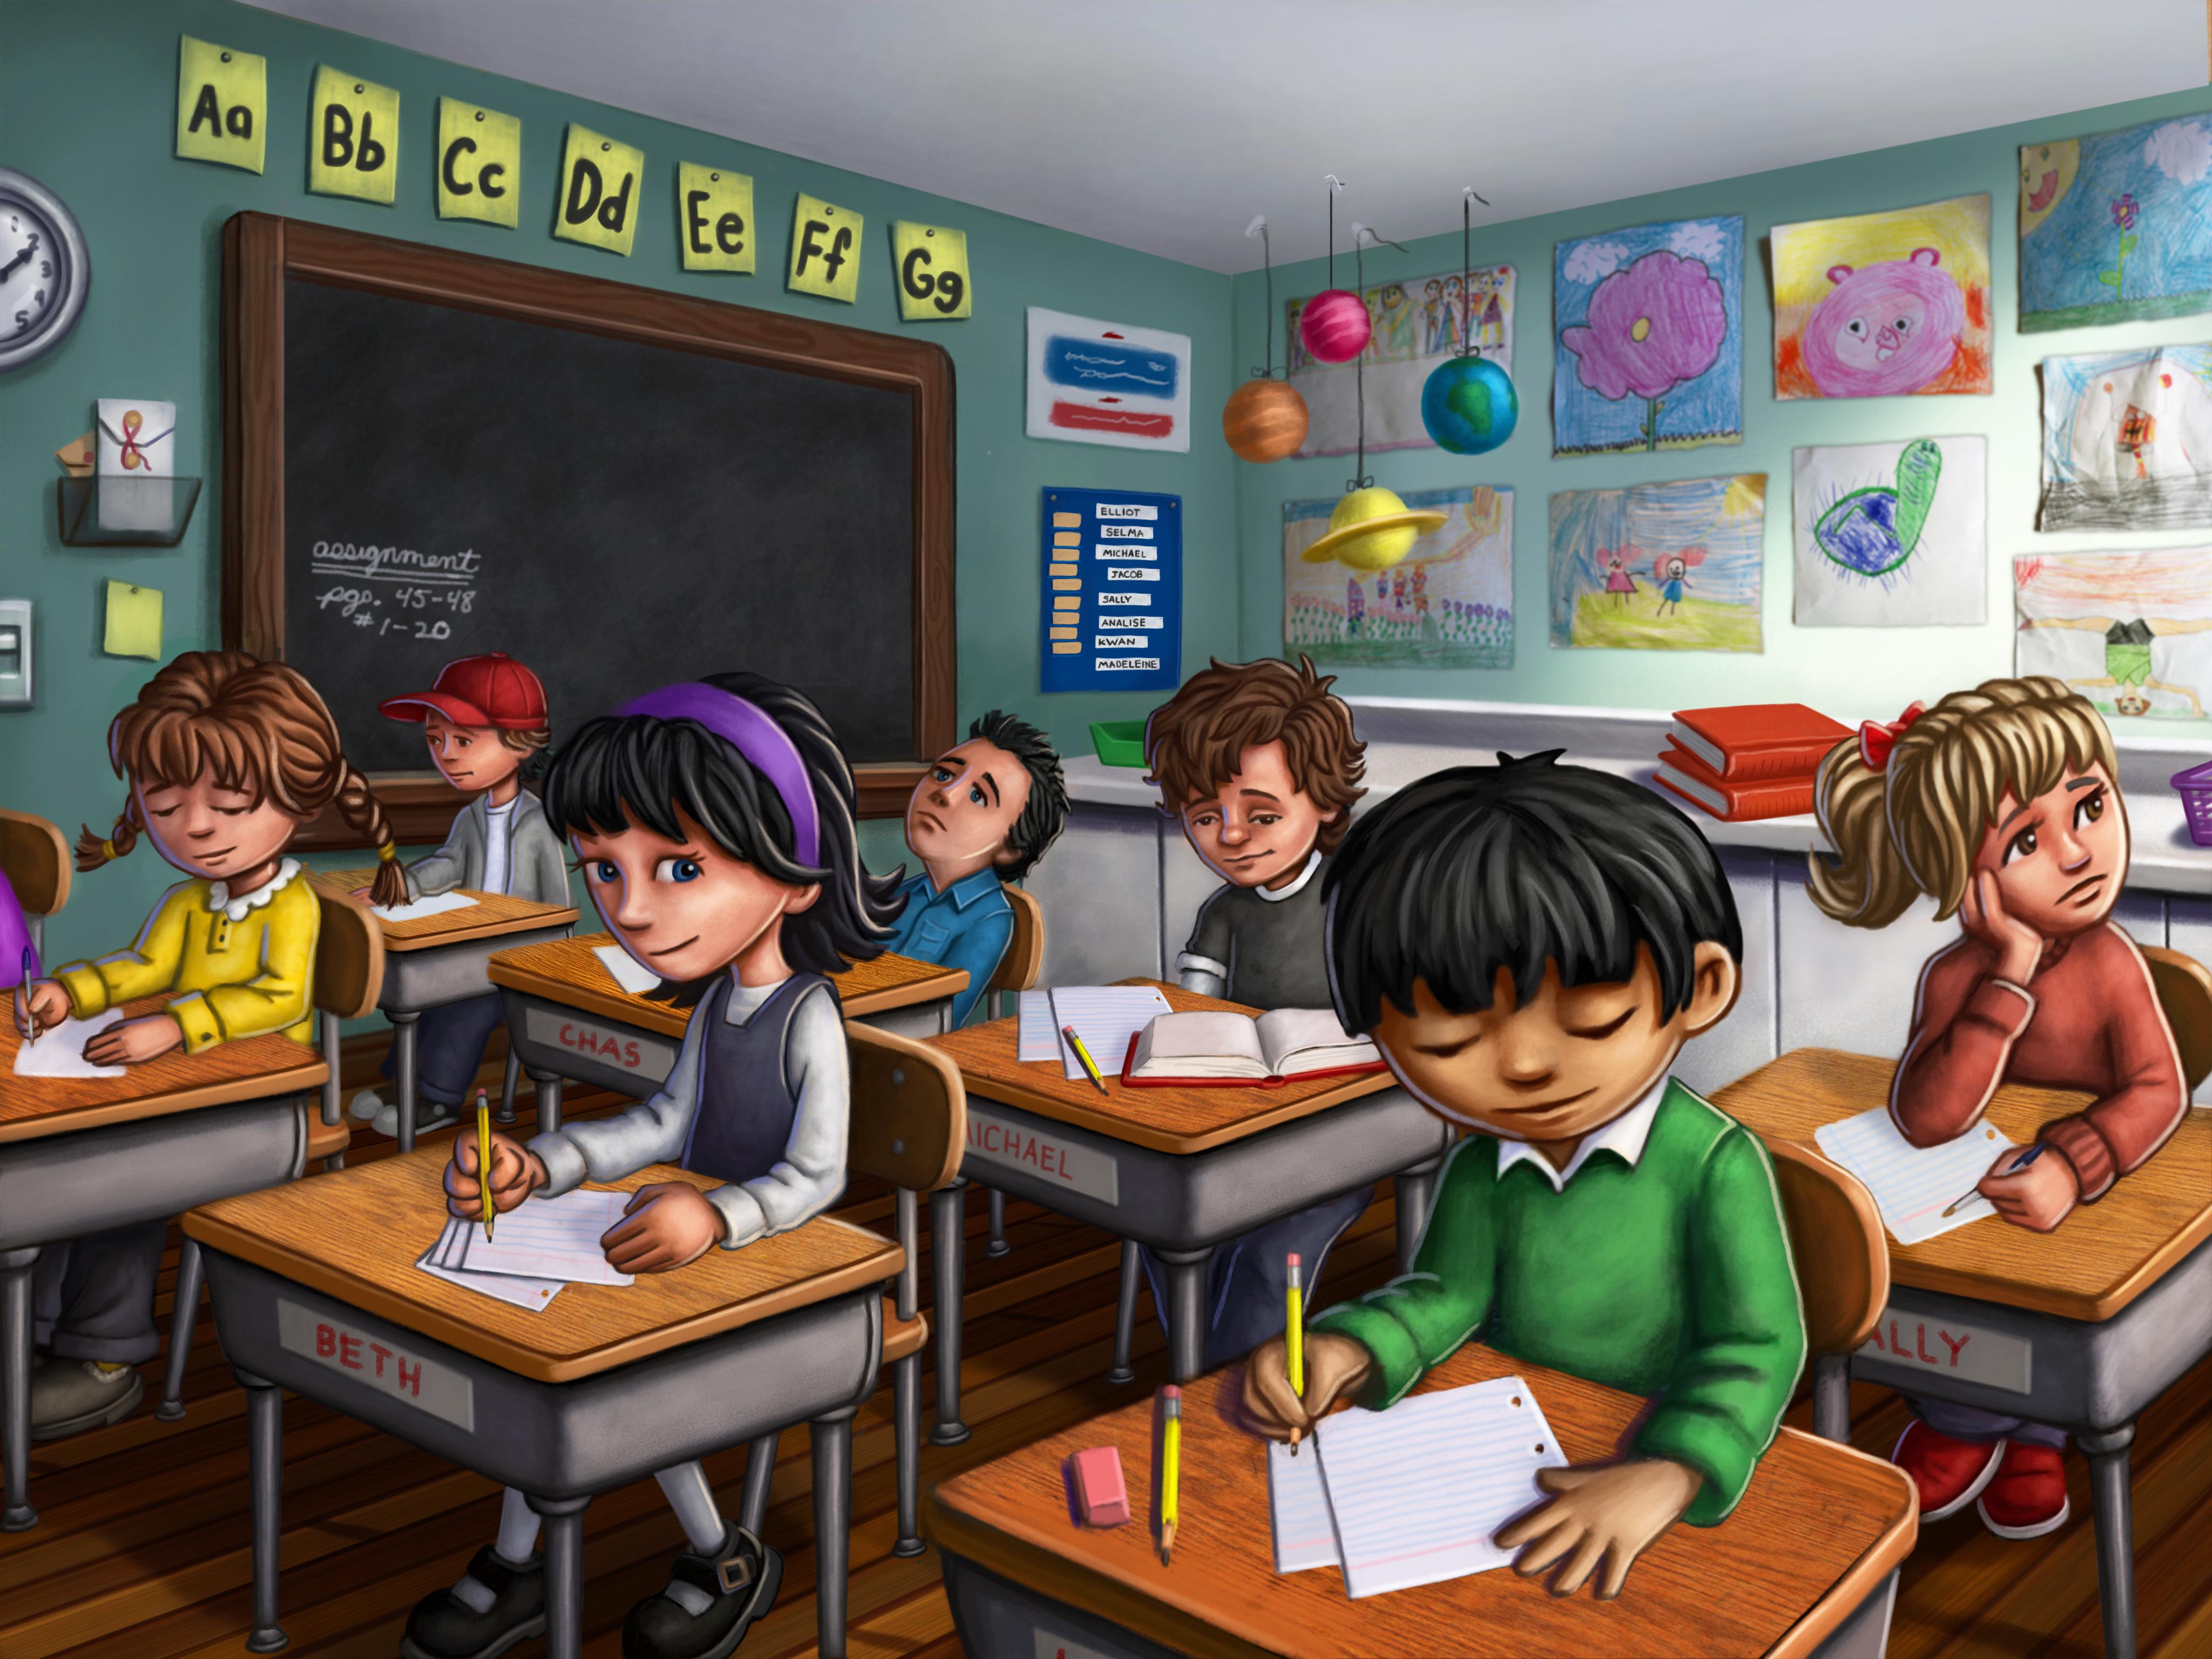 ... Classroom Clipart ... - Classroomclipart